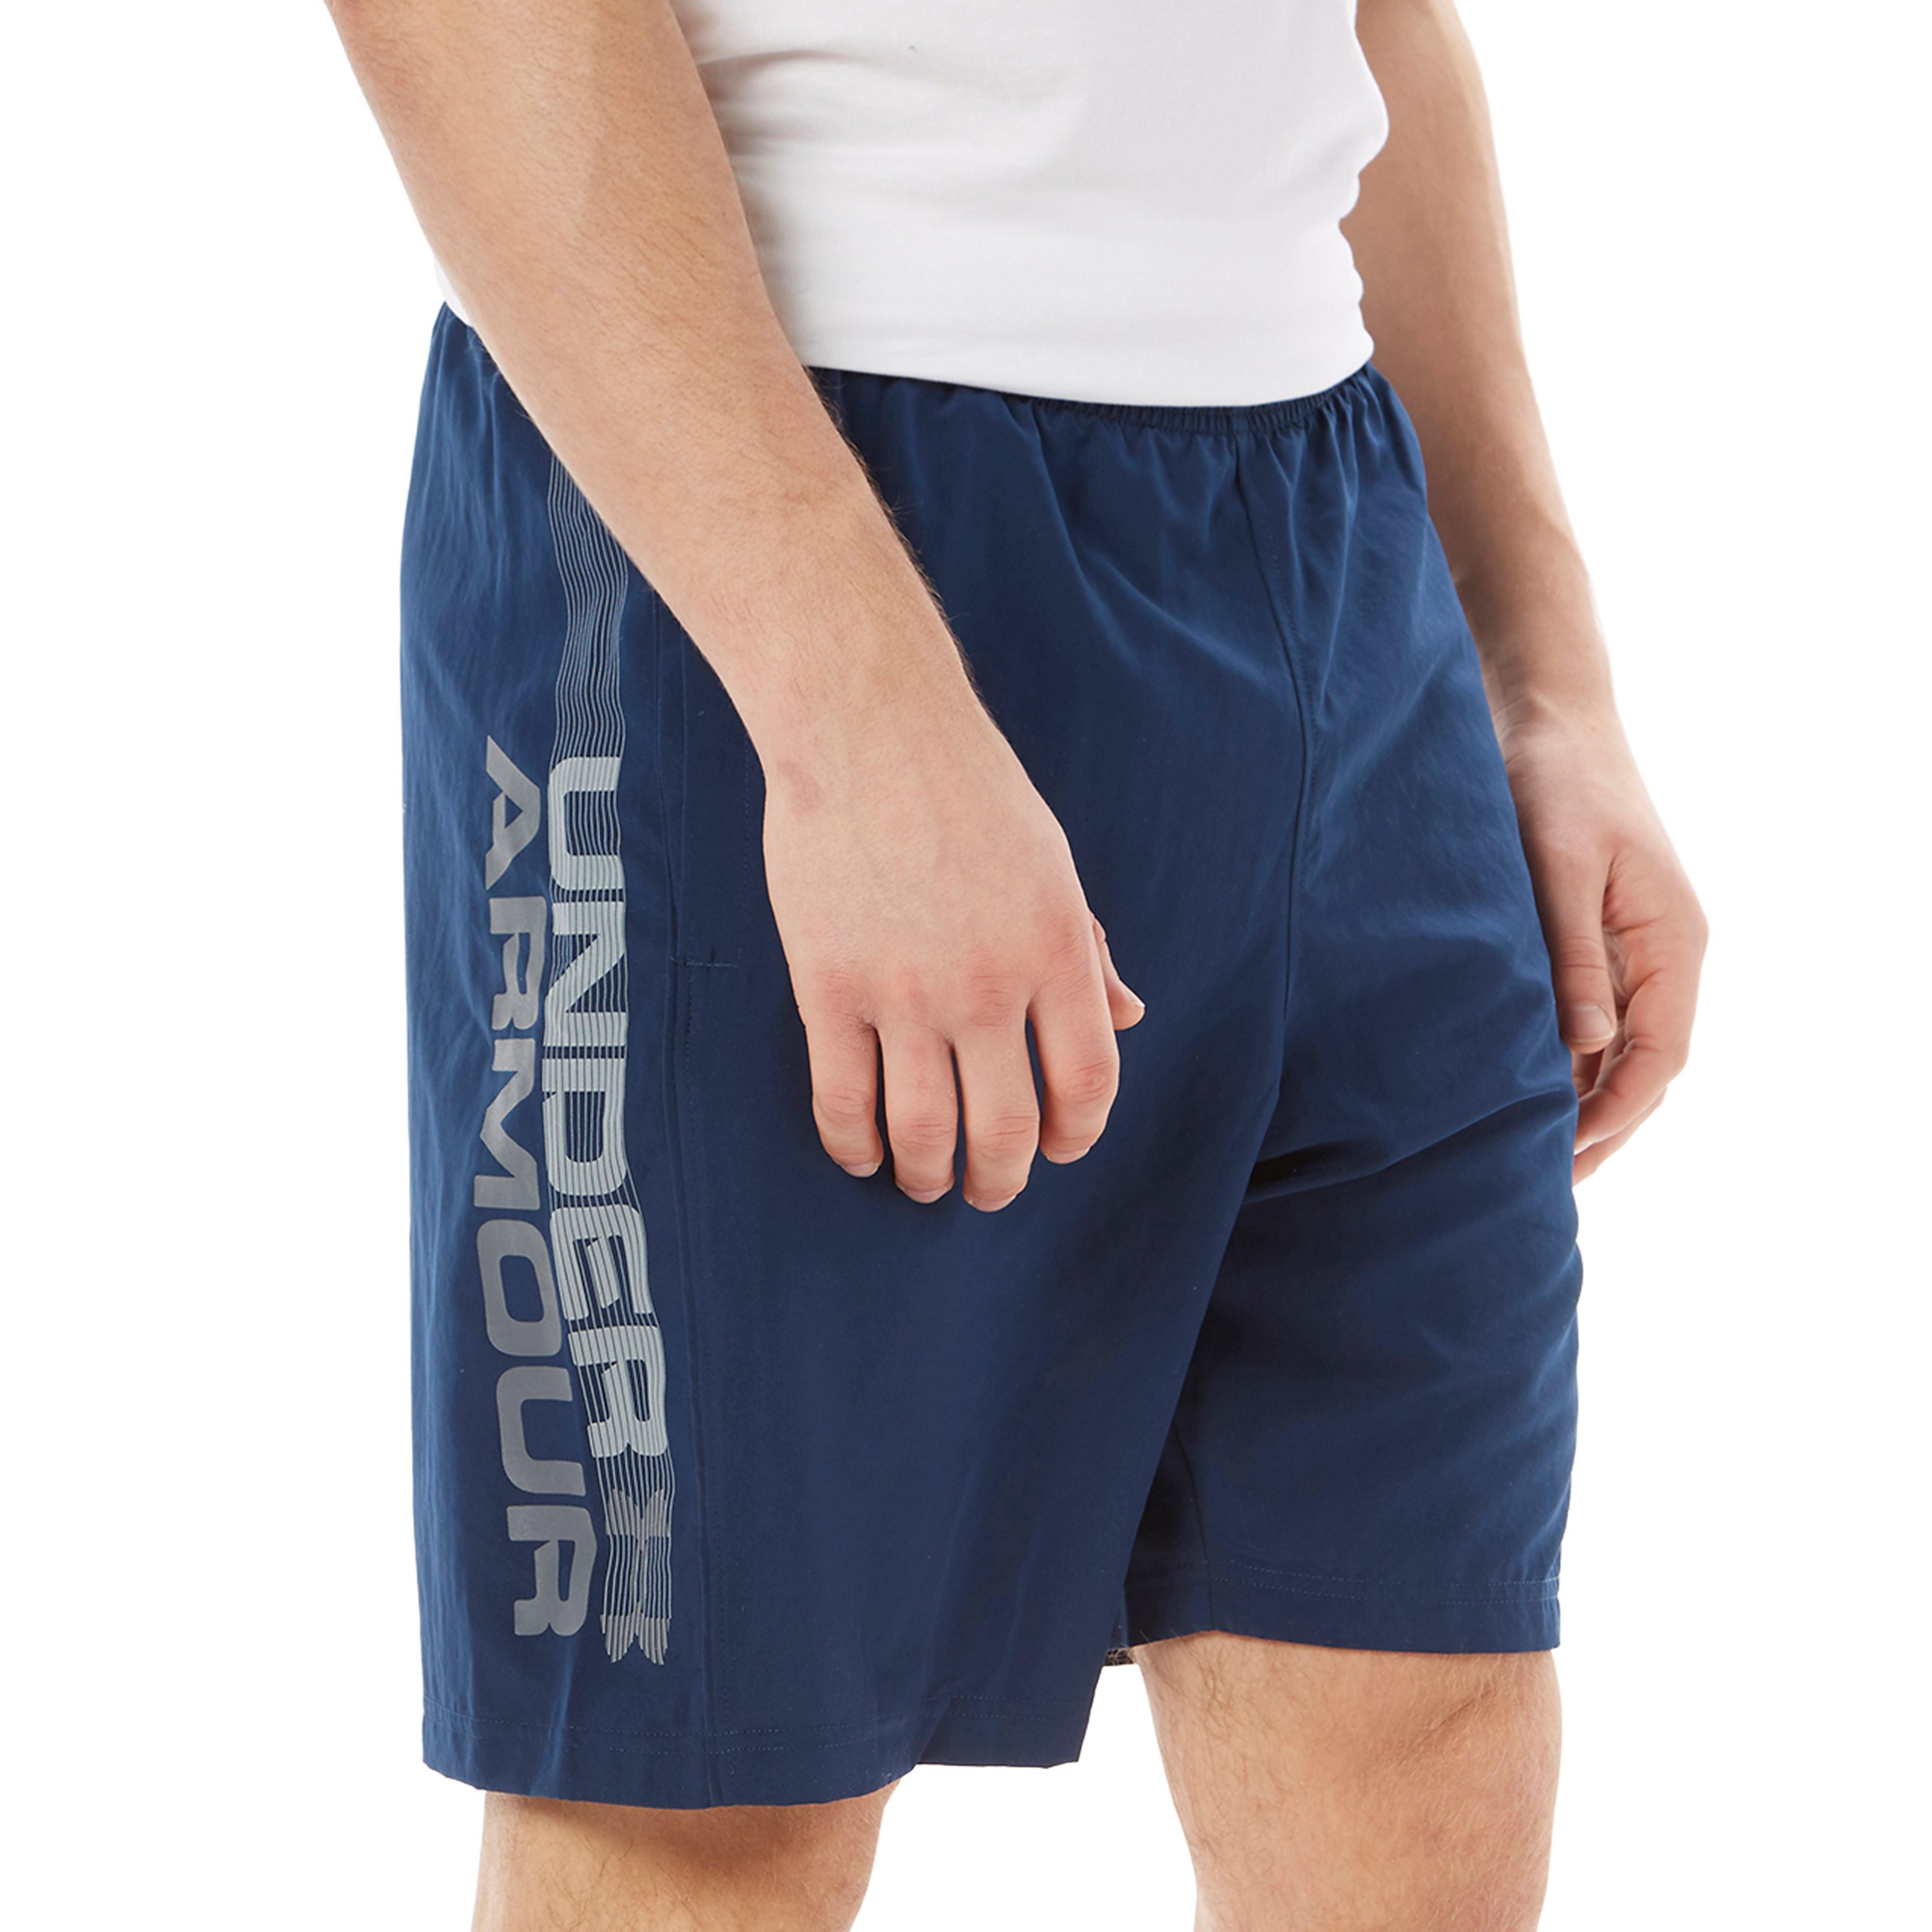 Under Armour Woven Graphic Wordmark Men's Training Shorts